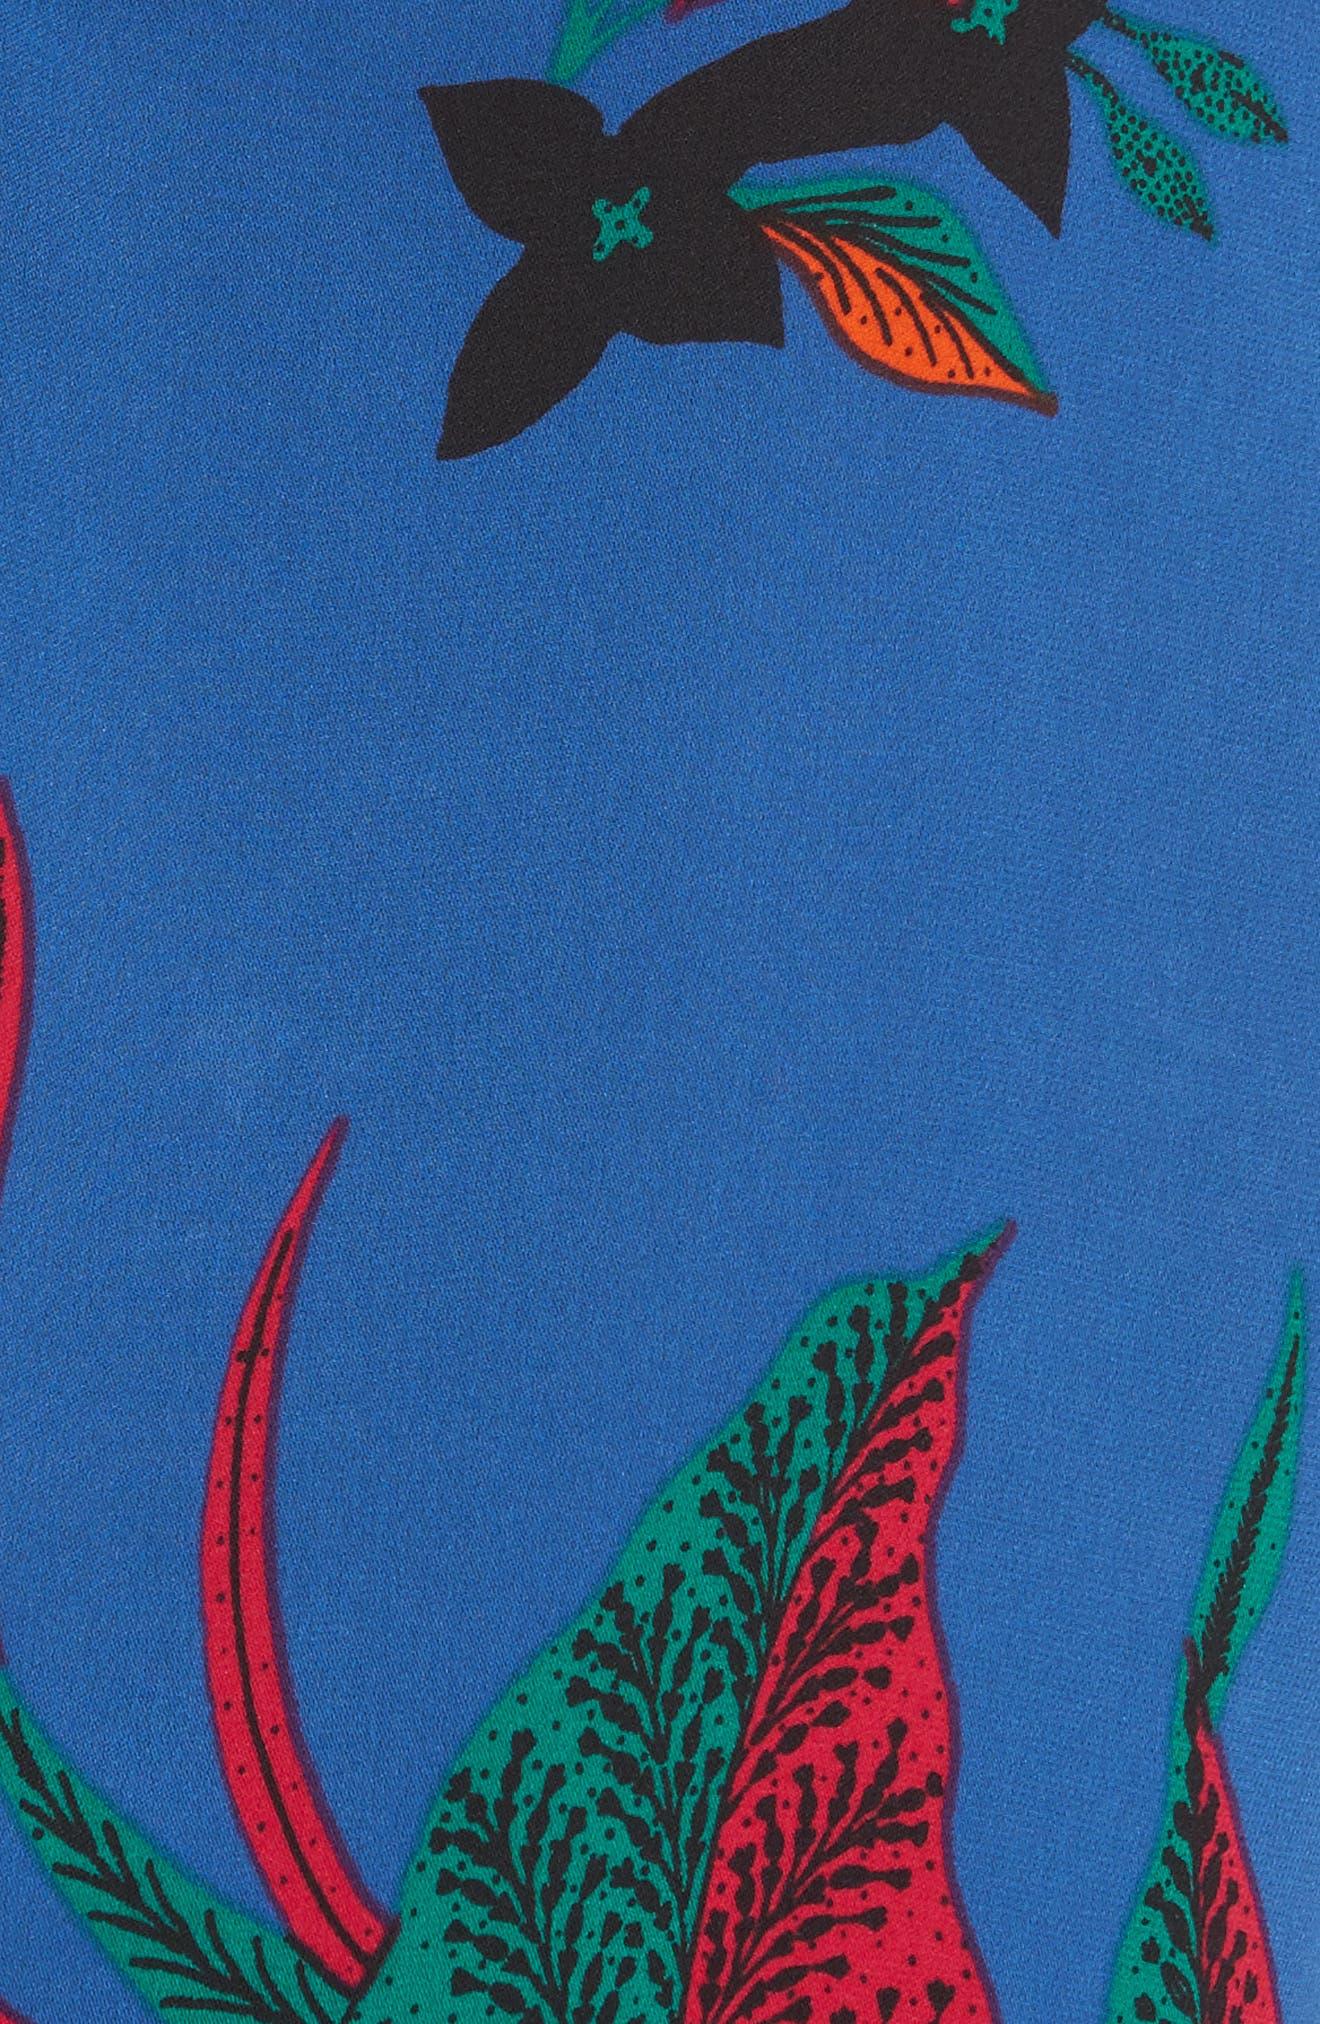 Diane von Furstenberg Floral Print Silk Shell,                             Alternate thumbnail 5, color,                             002